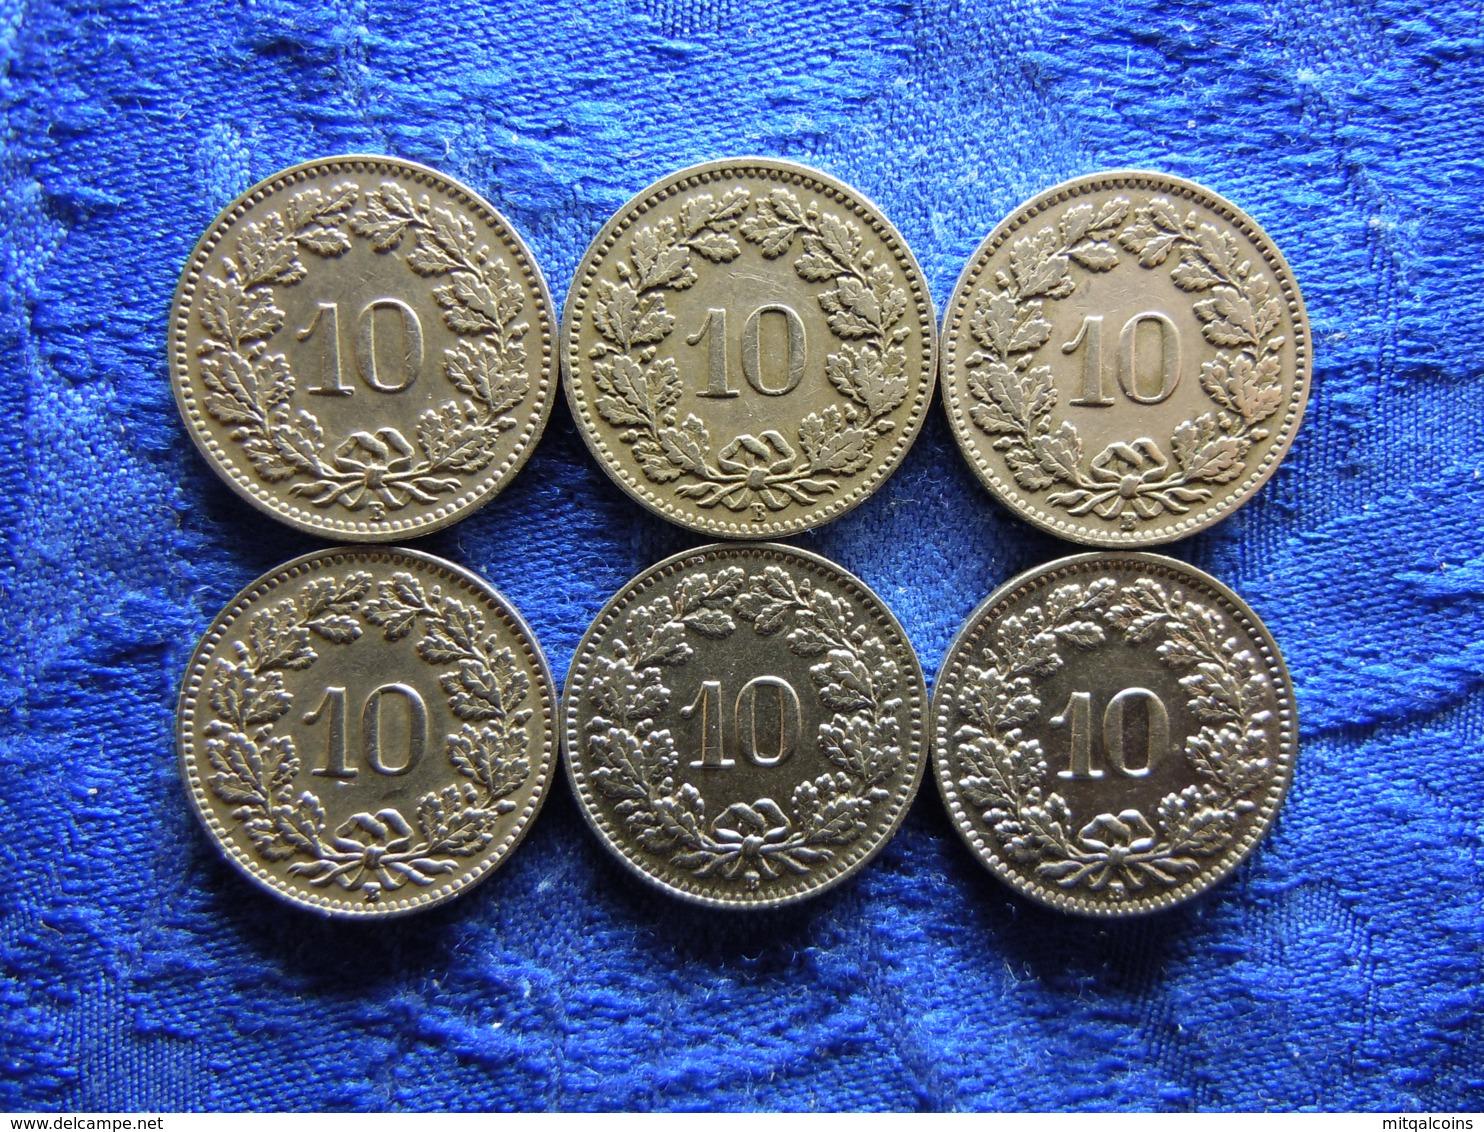 SWITZERLAND 10 RAPPEN 1881, 1882, 1925, 1927 KM27, 1938, 1939 KM27b (6) - Suisse